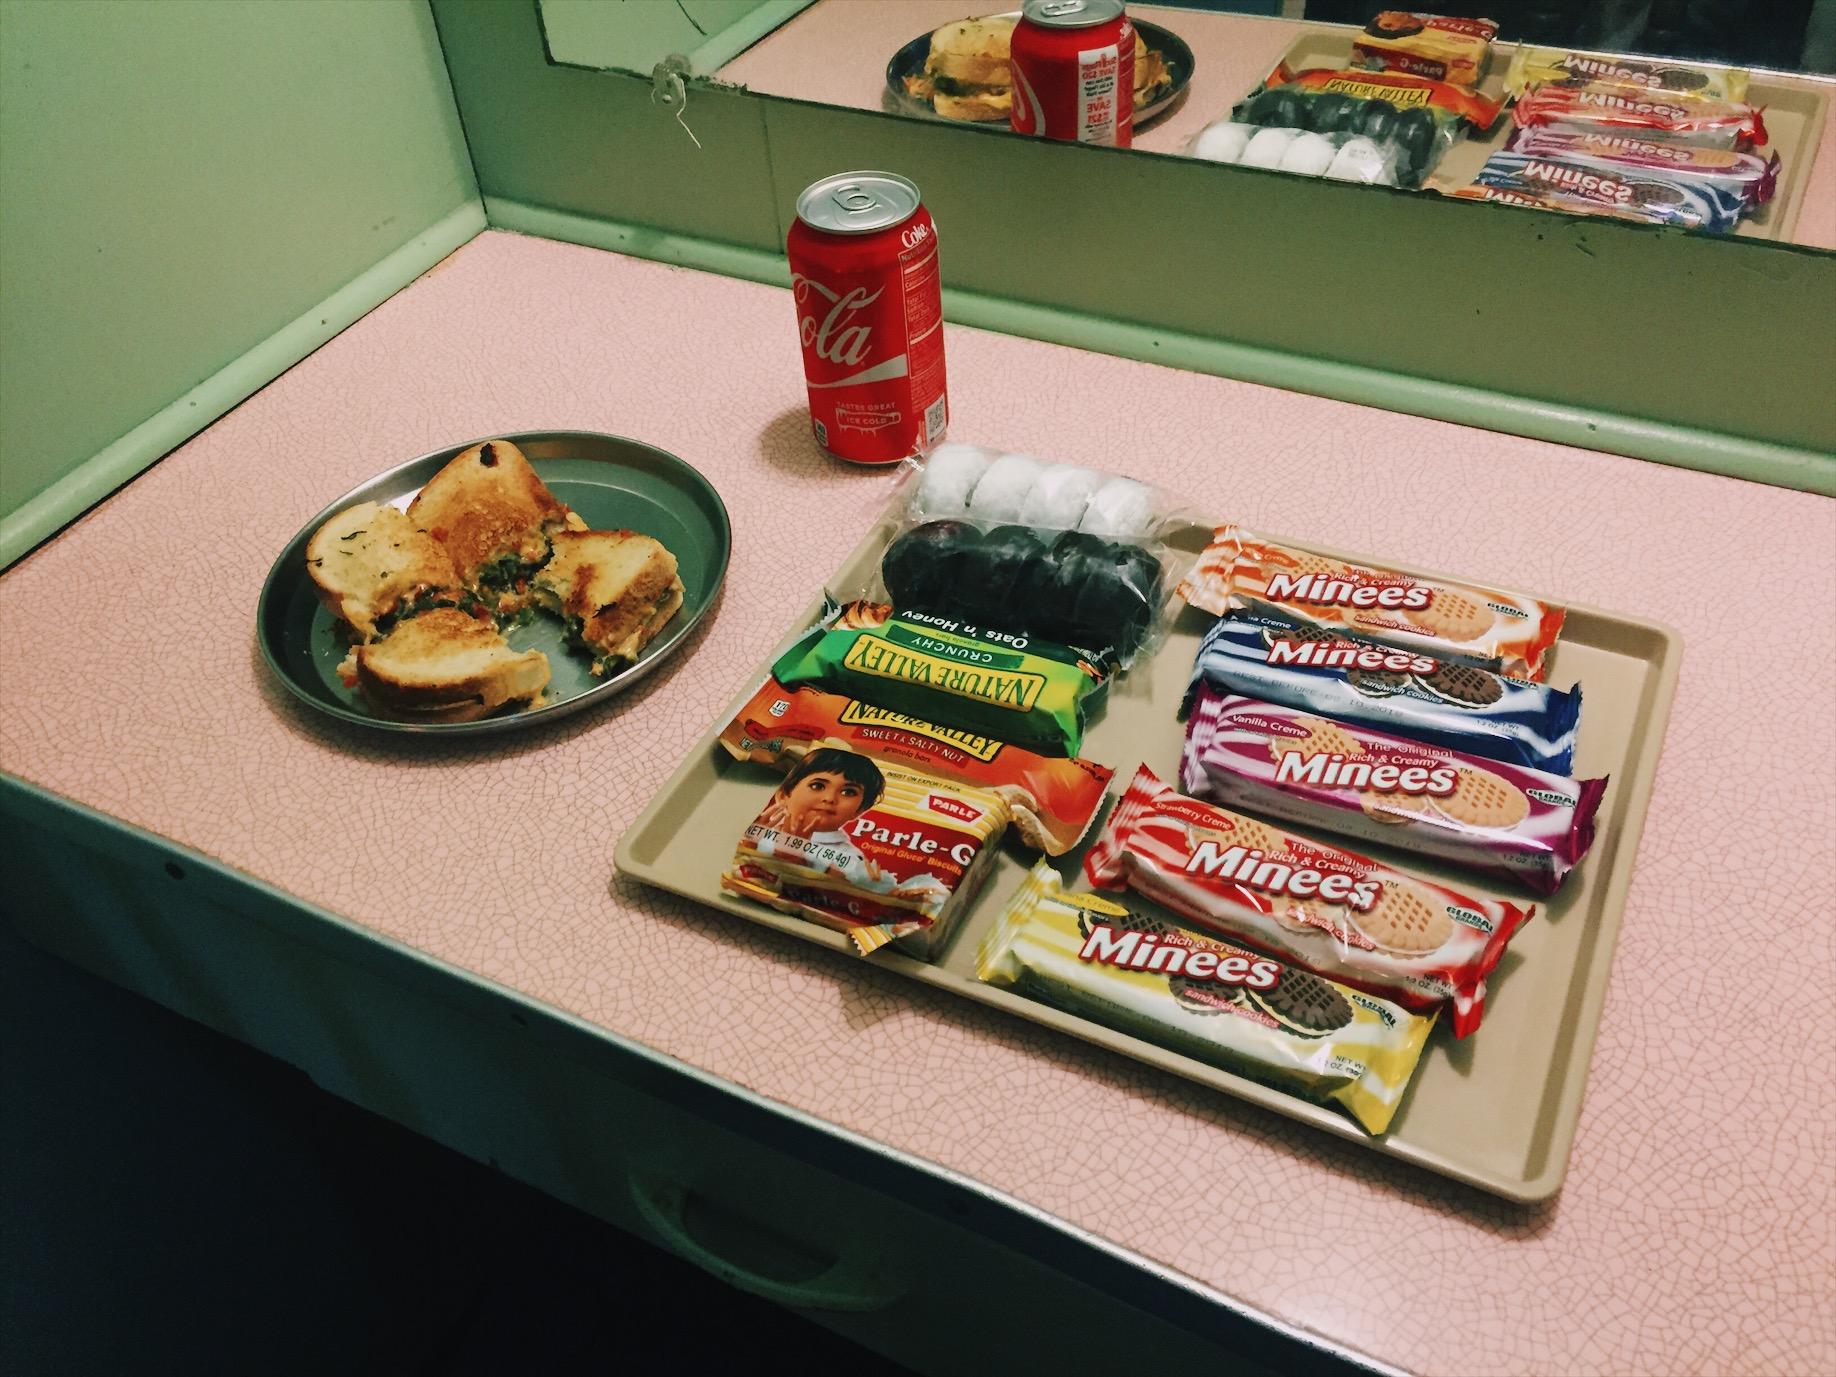 Snack tray, Budget Inn, Sanderson TX